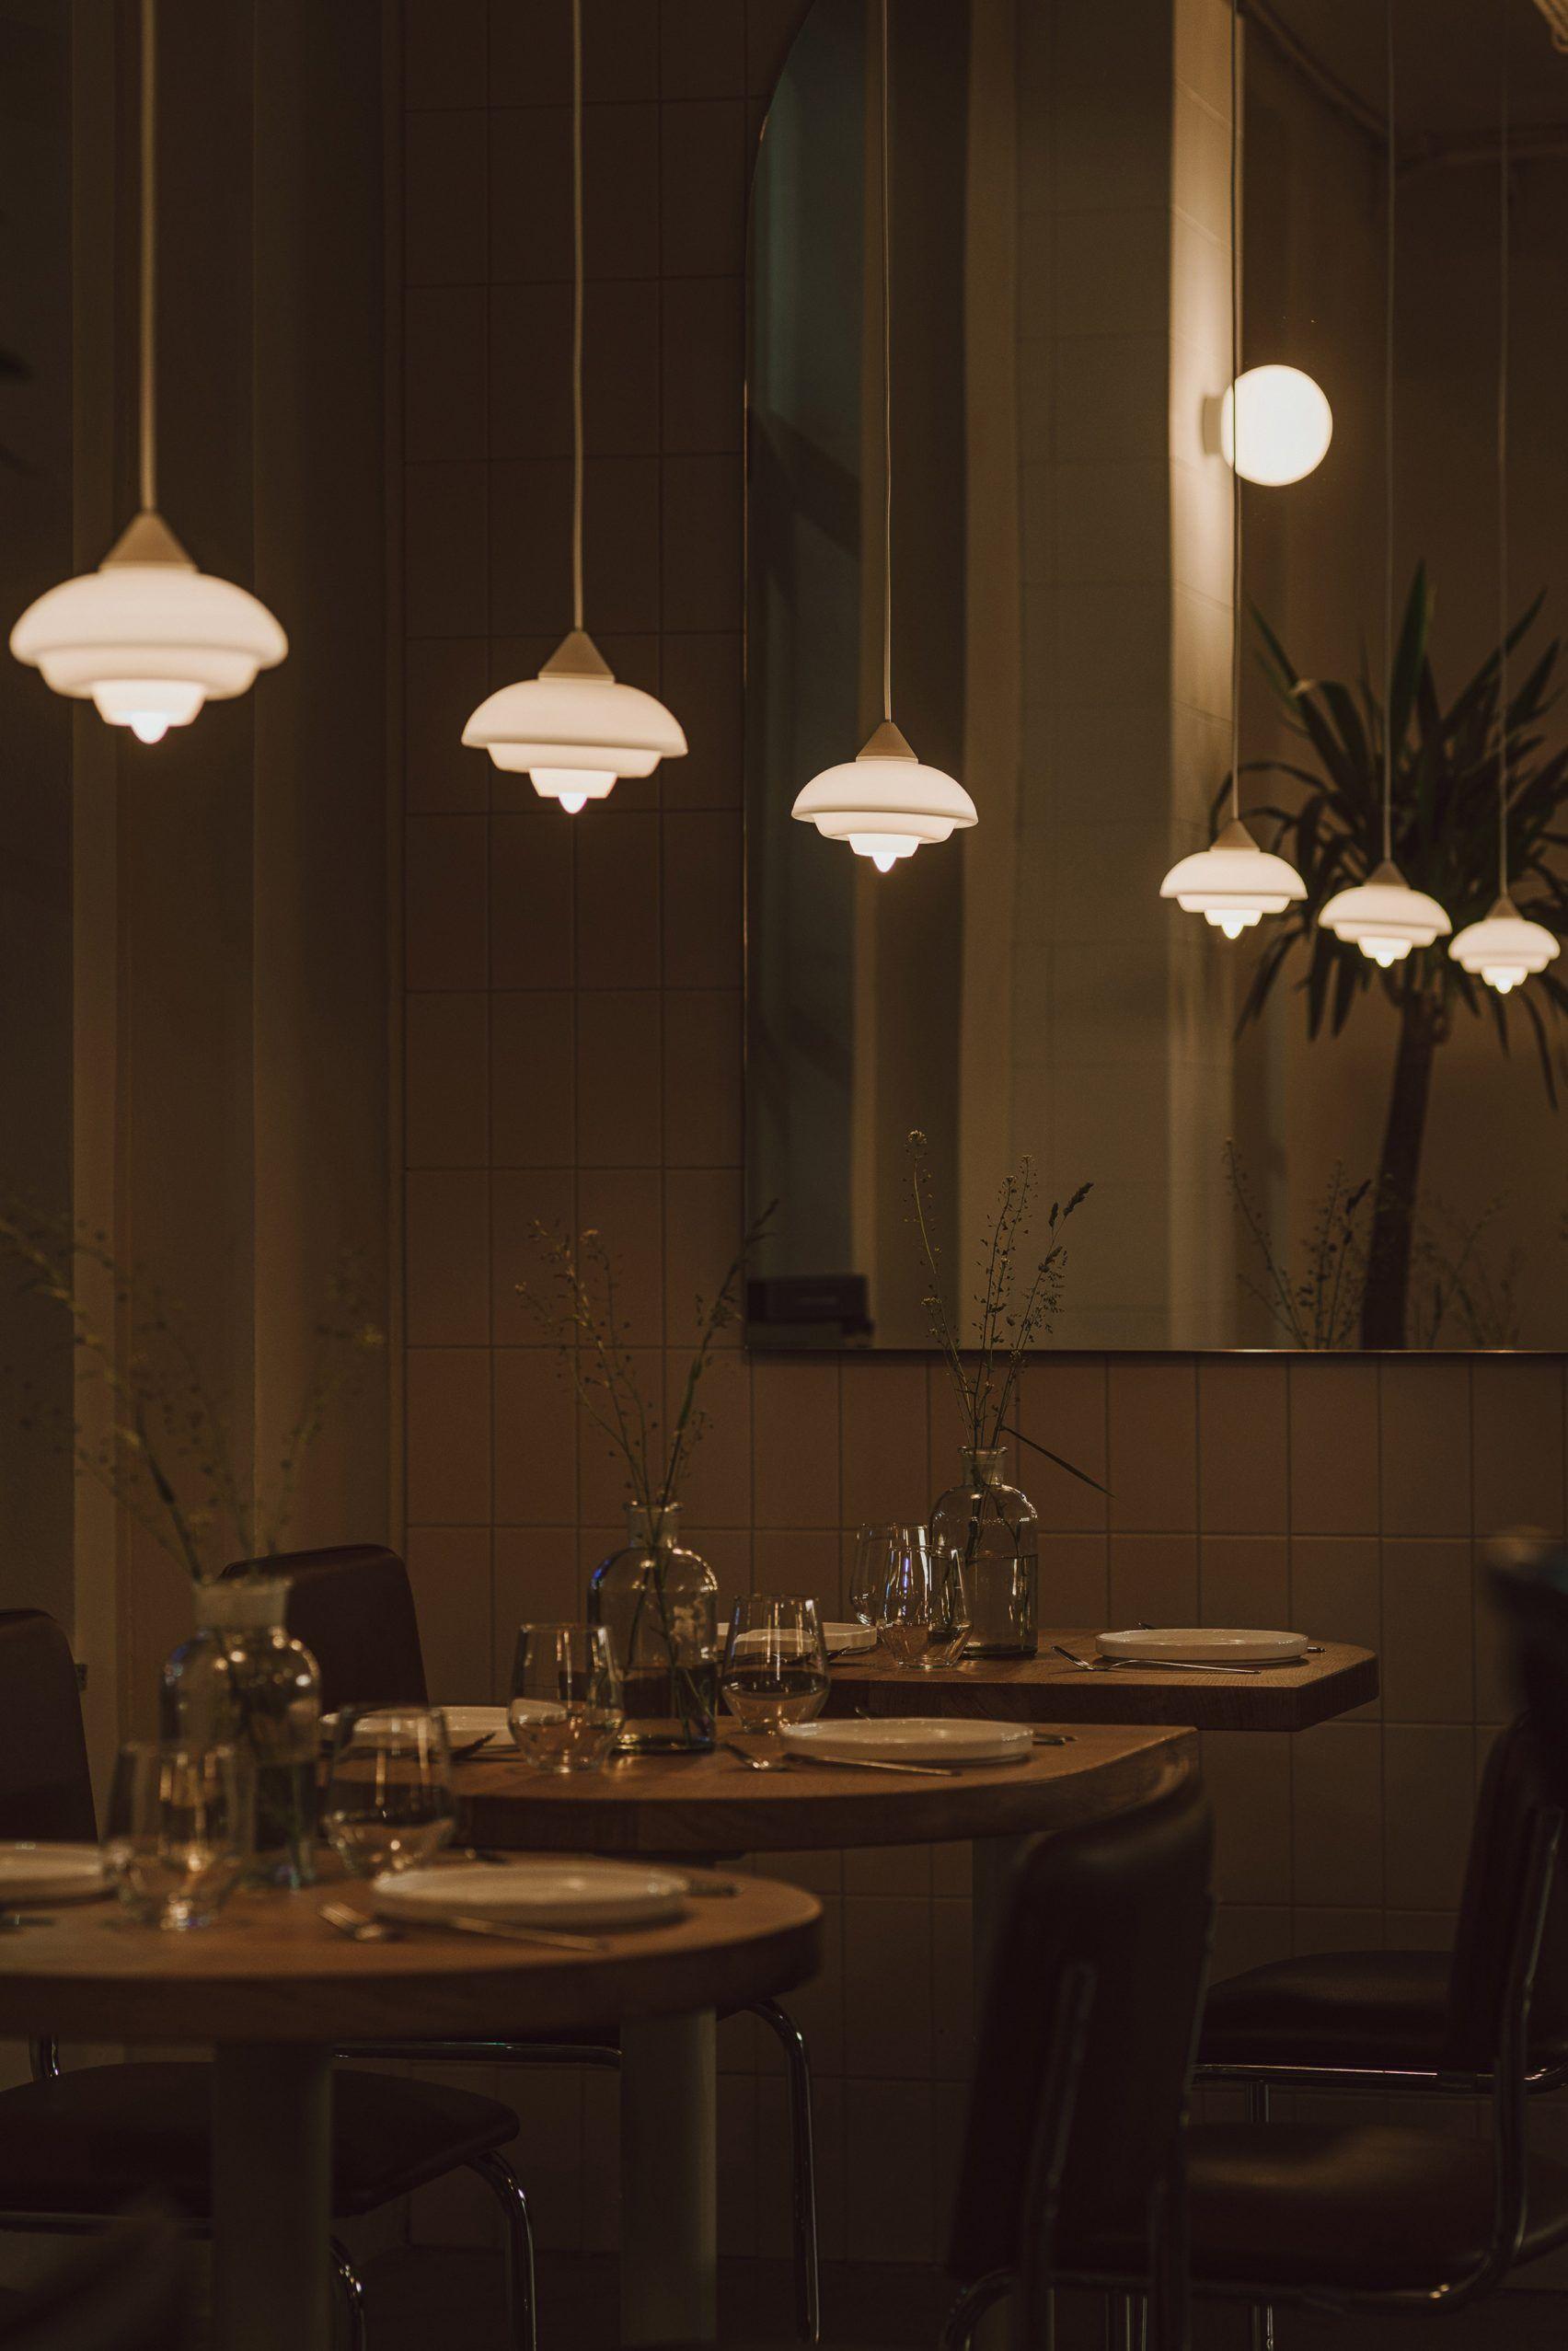 Nadzieja Restaurant In Poznan Features Understated Bauhaus Style Interiors In 2020 Lighting Design Interior Restaurant Lighting Design Bauhaus Style